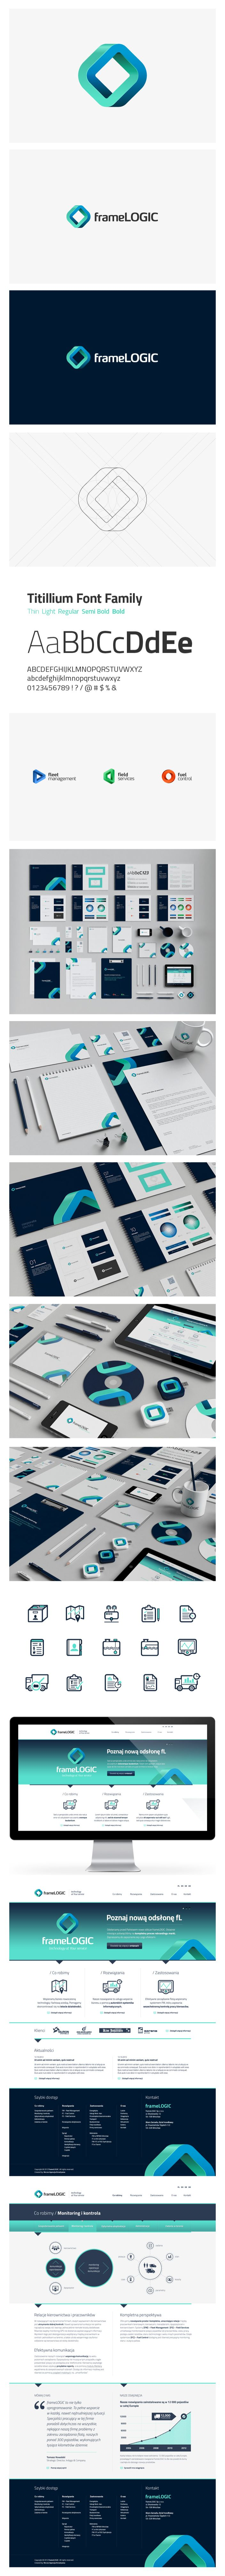 frameLOGIC Branding, made by NECON CREATIVE AGENCY